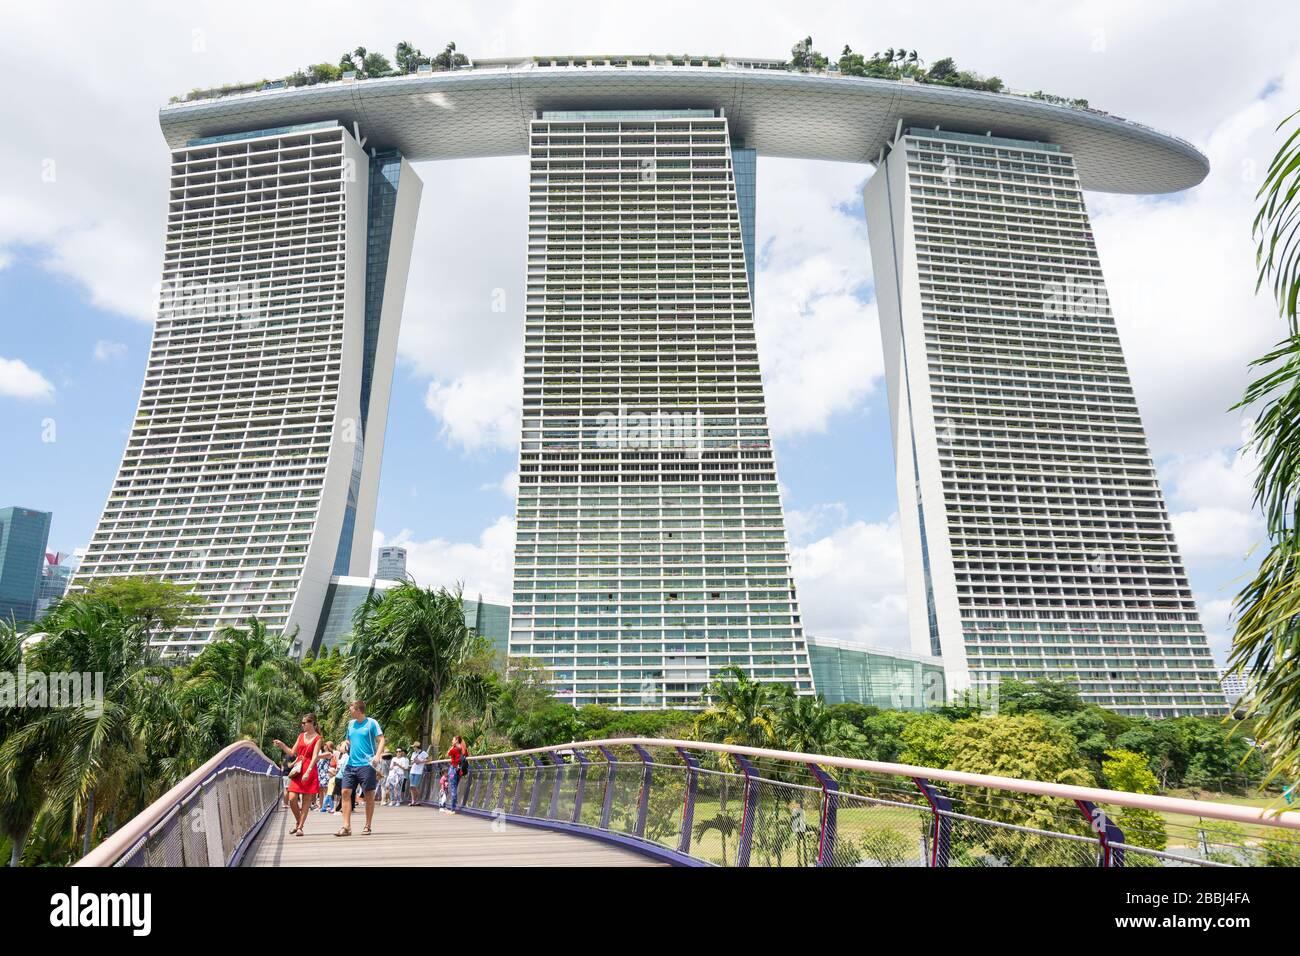 Marina Bay Sands Resort, Bayfront Avenue, Downtown Core, Singapore Island (Pulau Ujong), Singapore Stock Photo